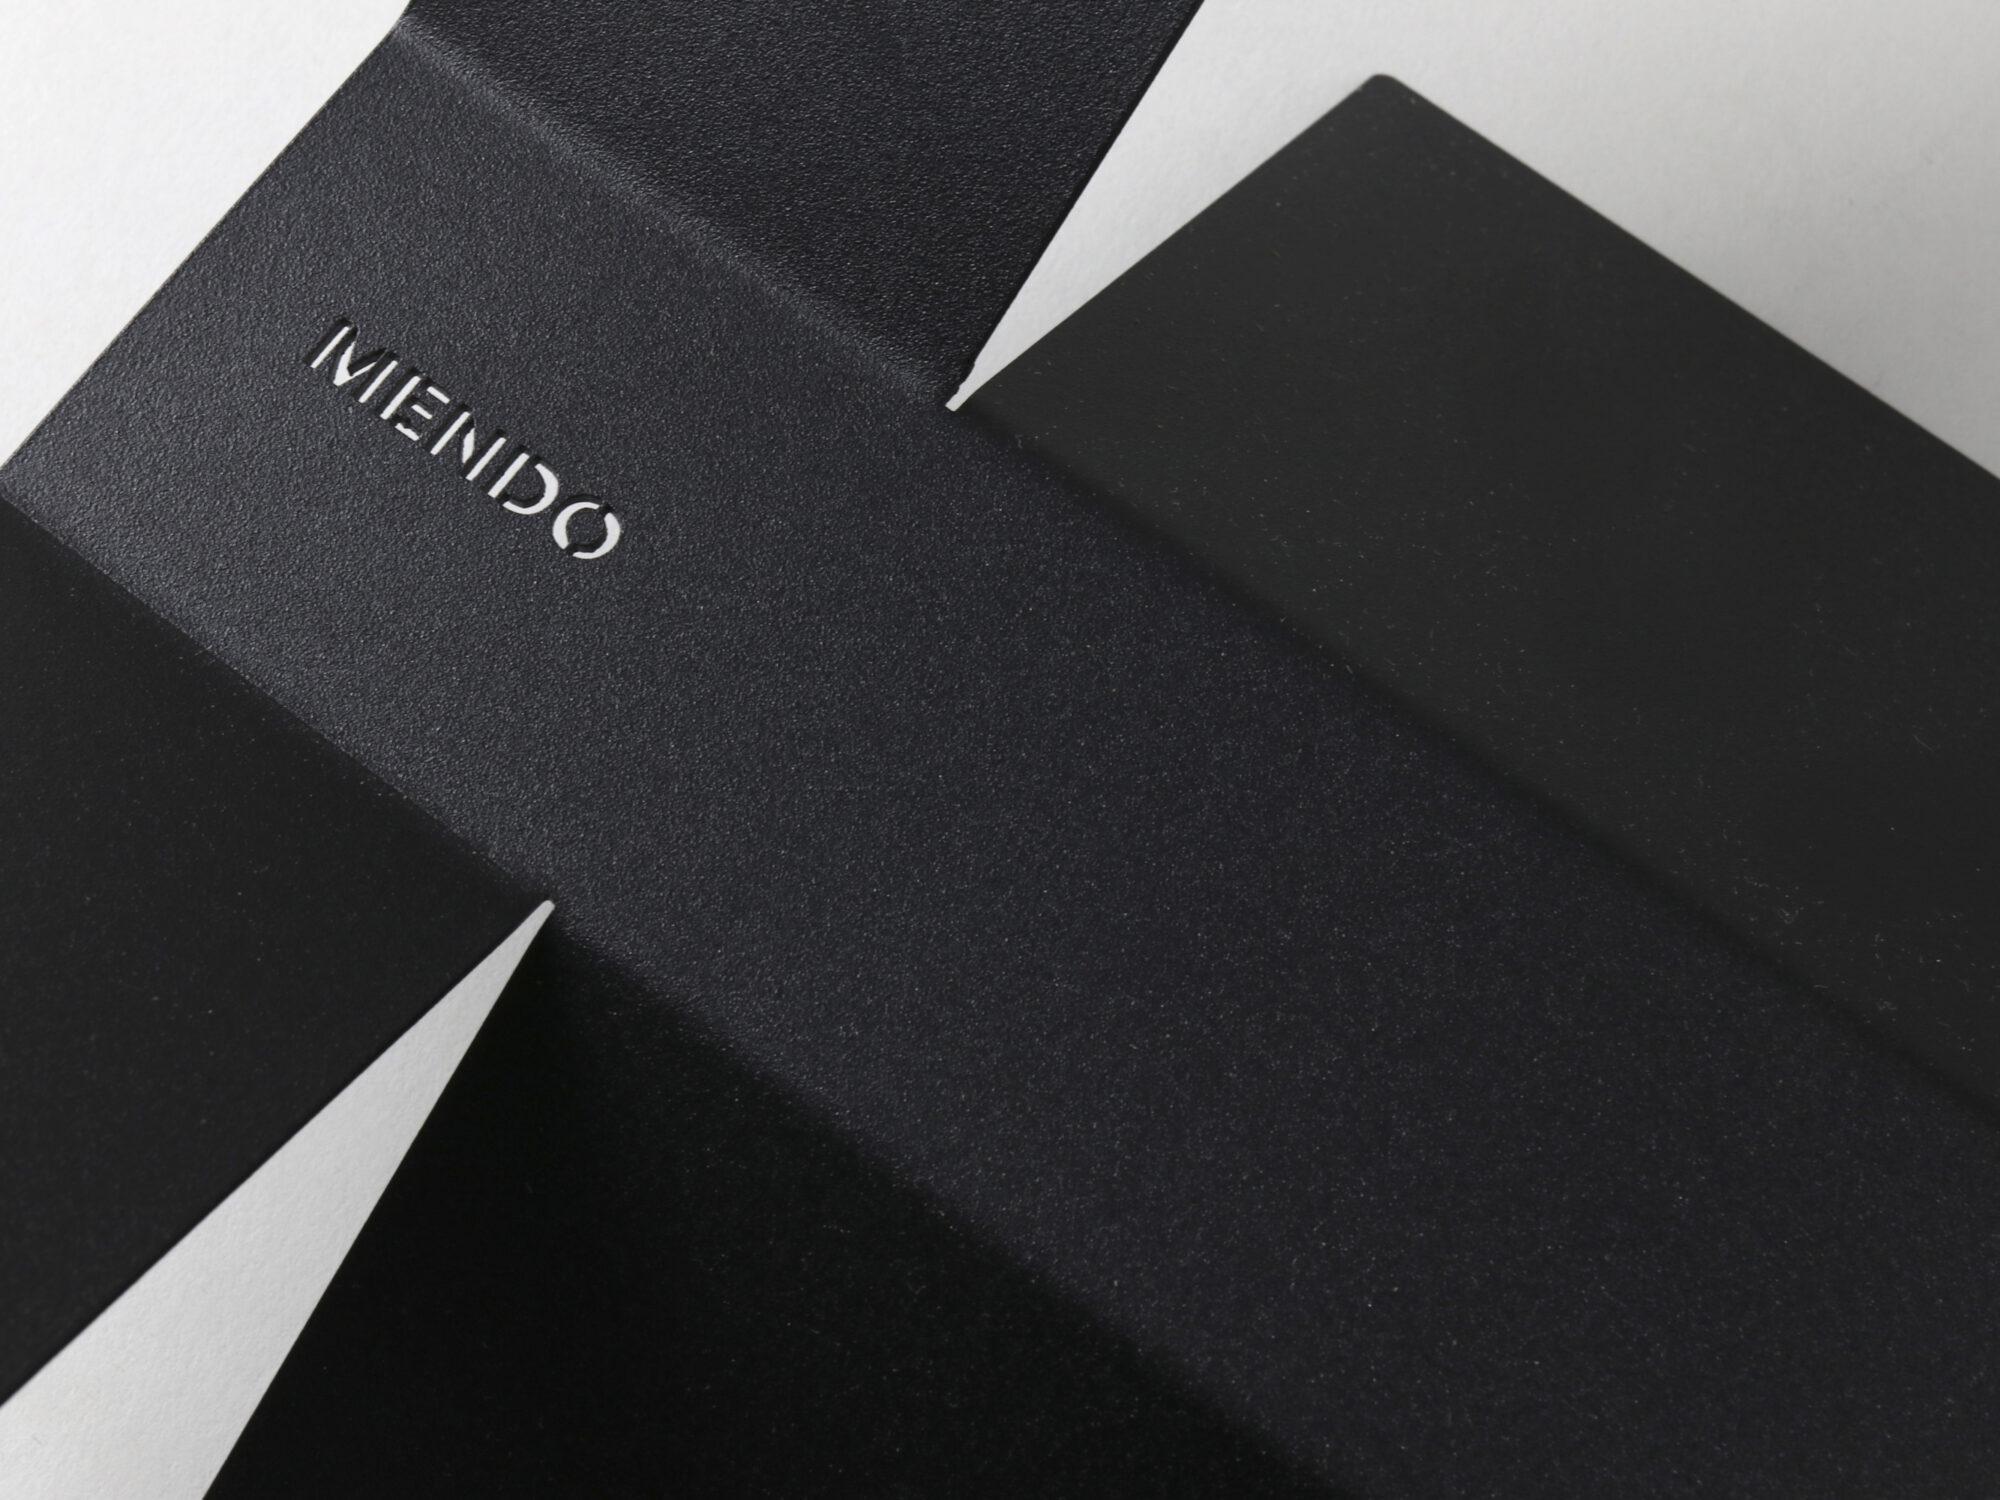 Mendo bookstand detail with logo.